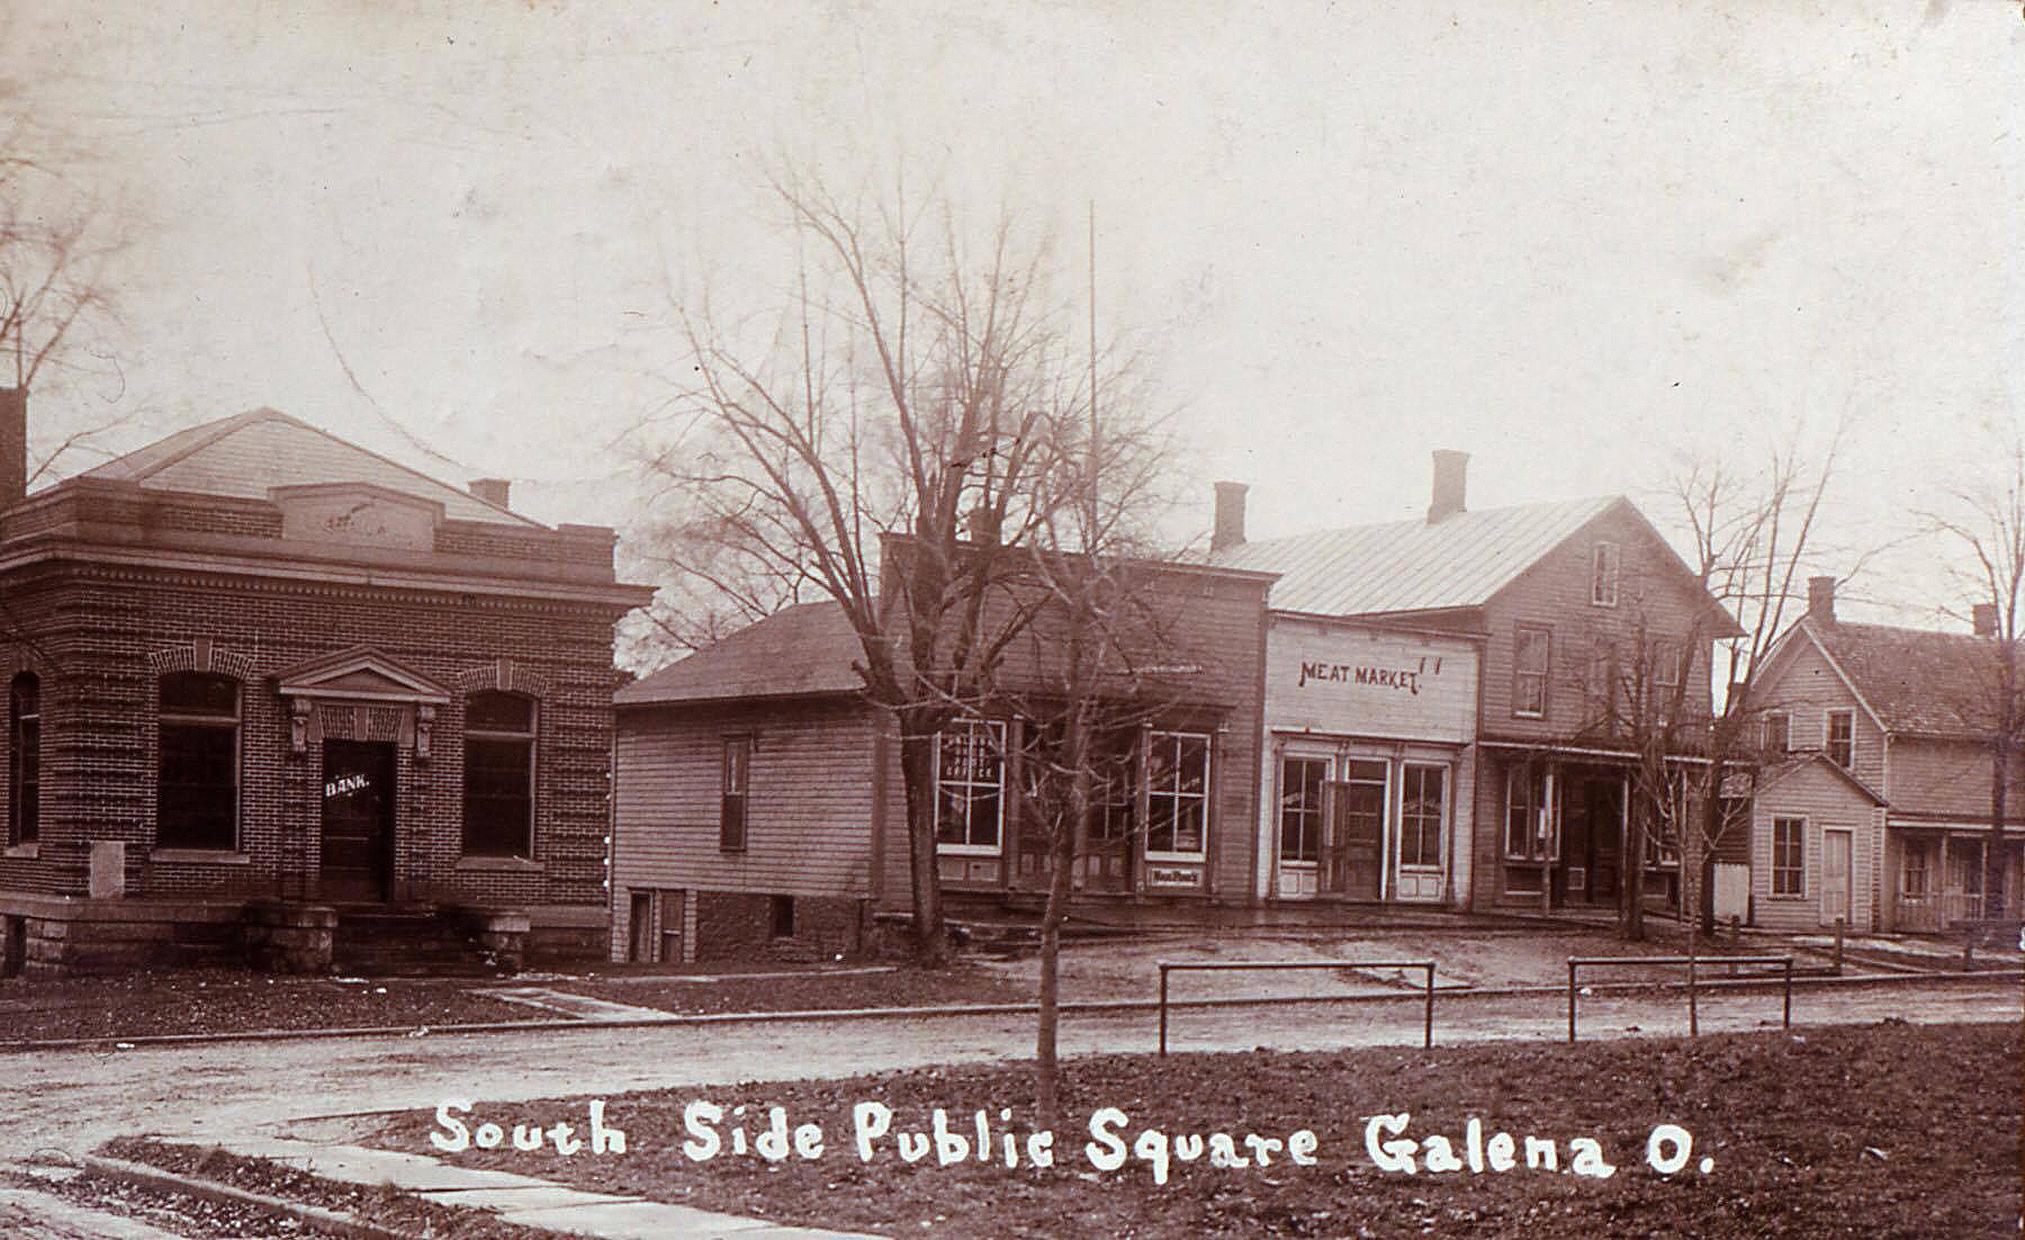 South Side Public Square